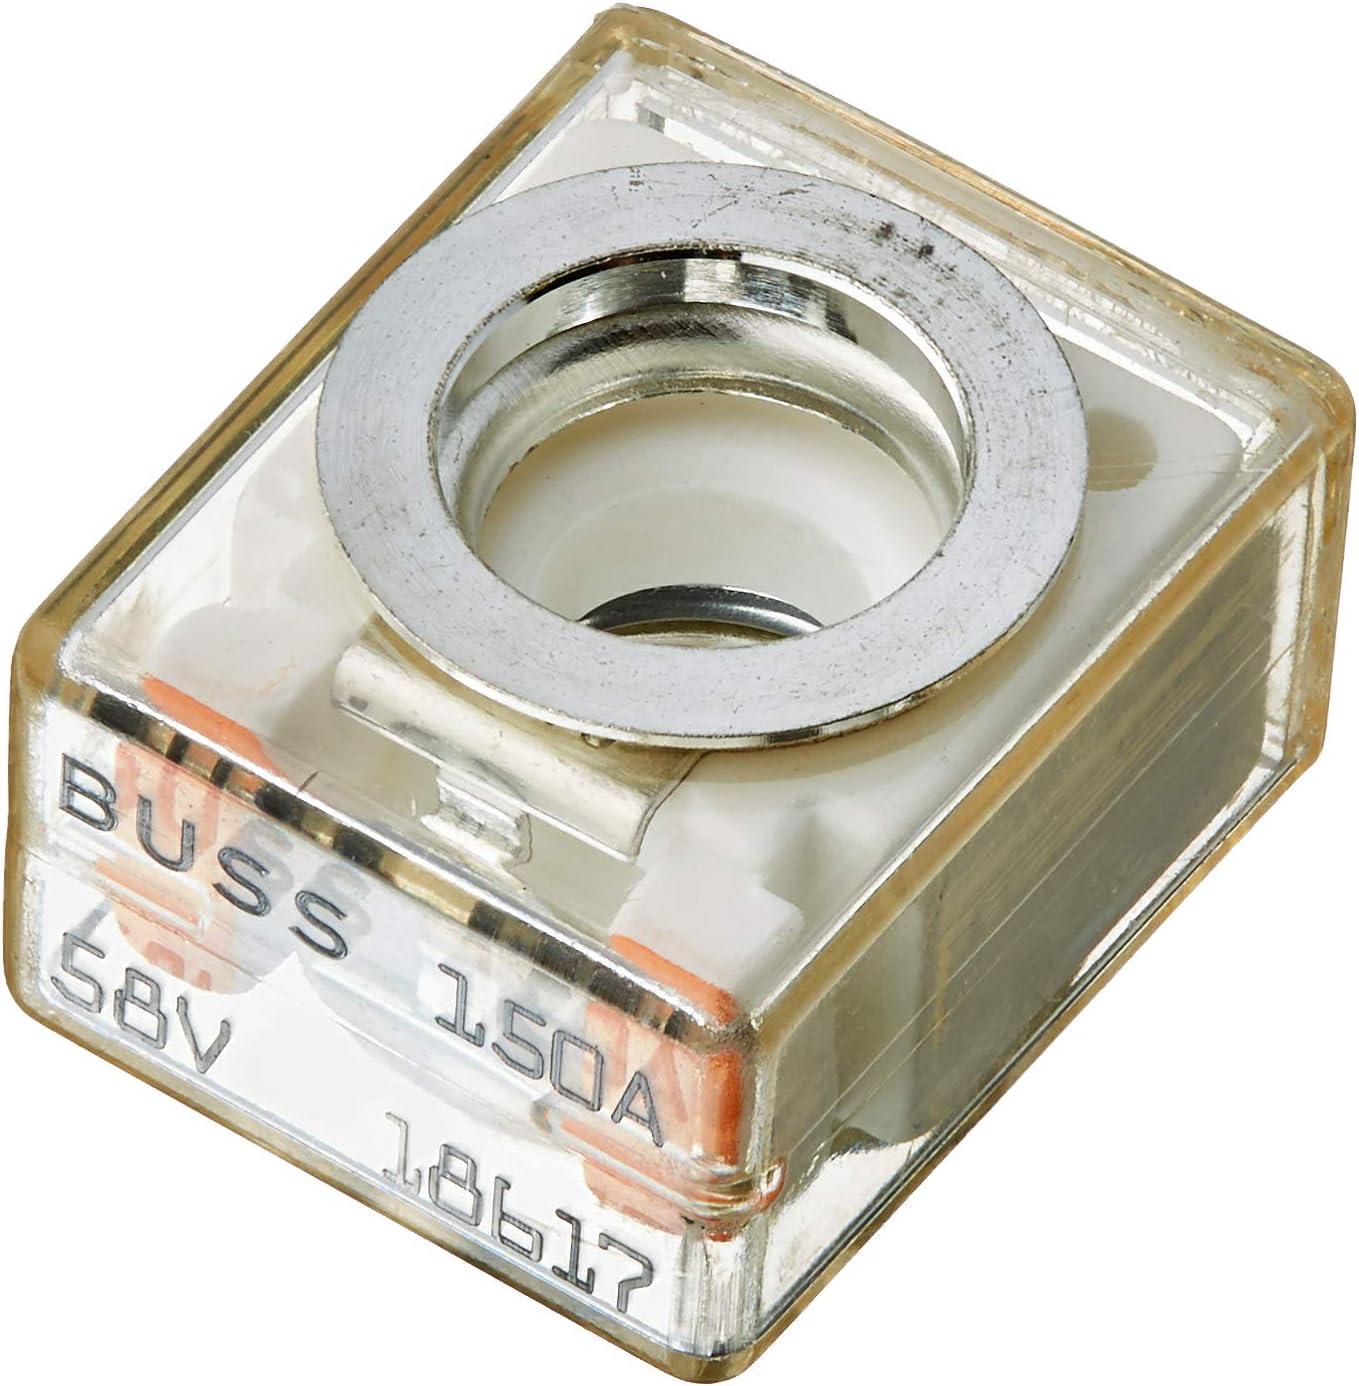 150 amp fuse box amazon com bussmann cbbf 150 marine rated battery fuse  150 amp  bussmann cbbf 150 marine rated battery